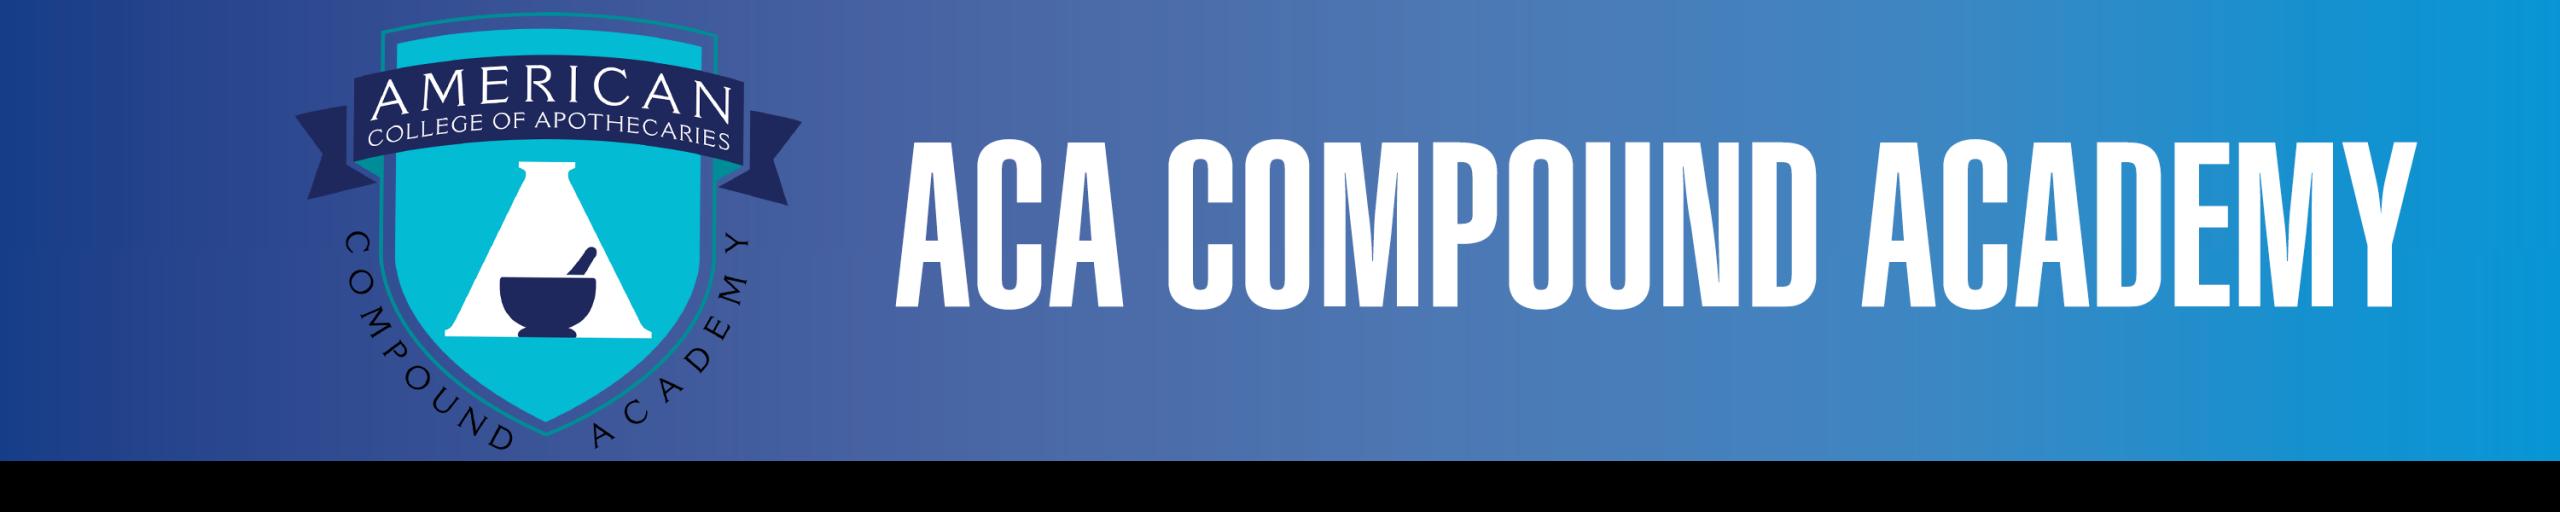 Compound Academy